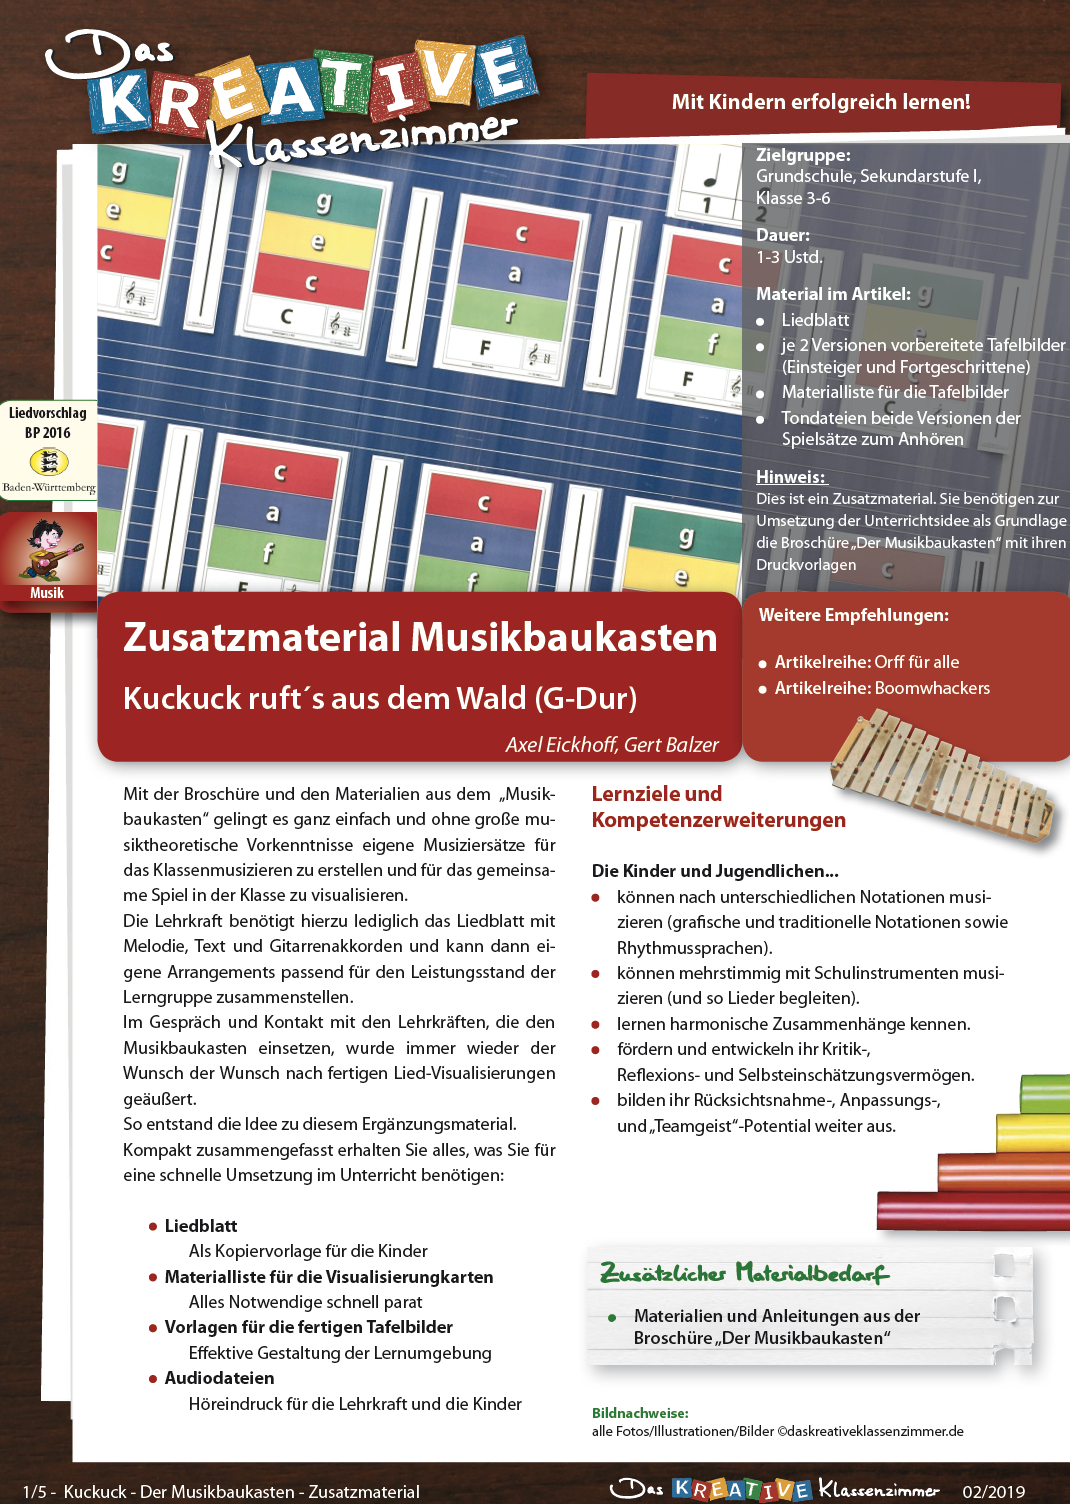 Kuckuck ruft's aus dem Wald - Zusatzmaterial Musikbaukasten